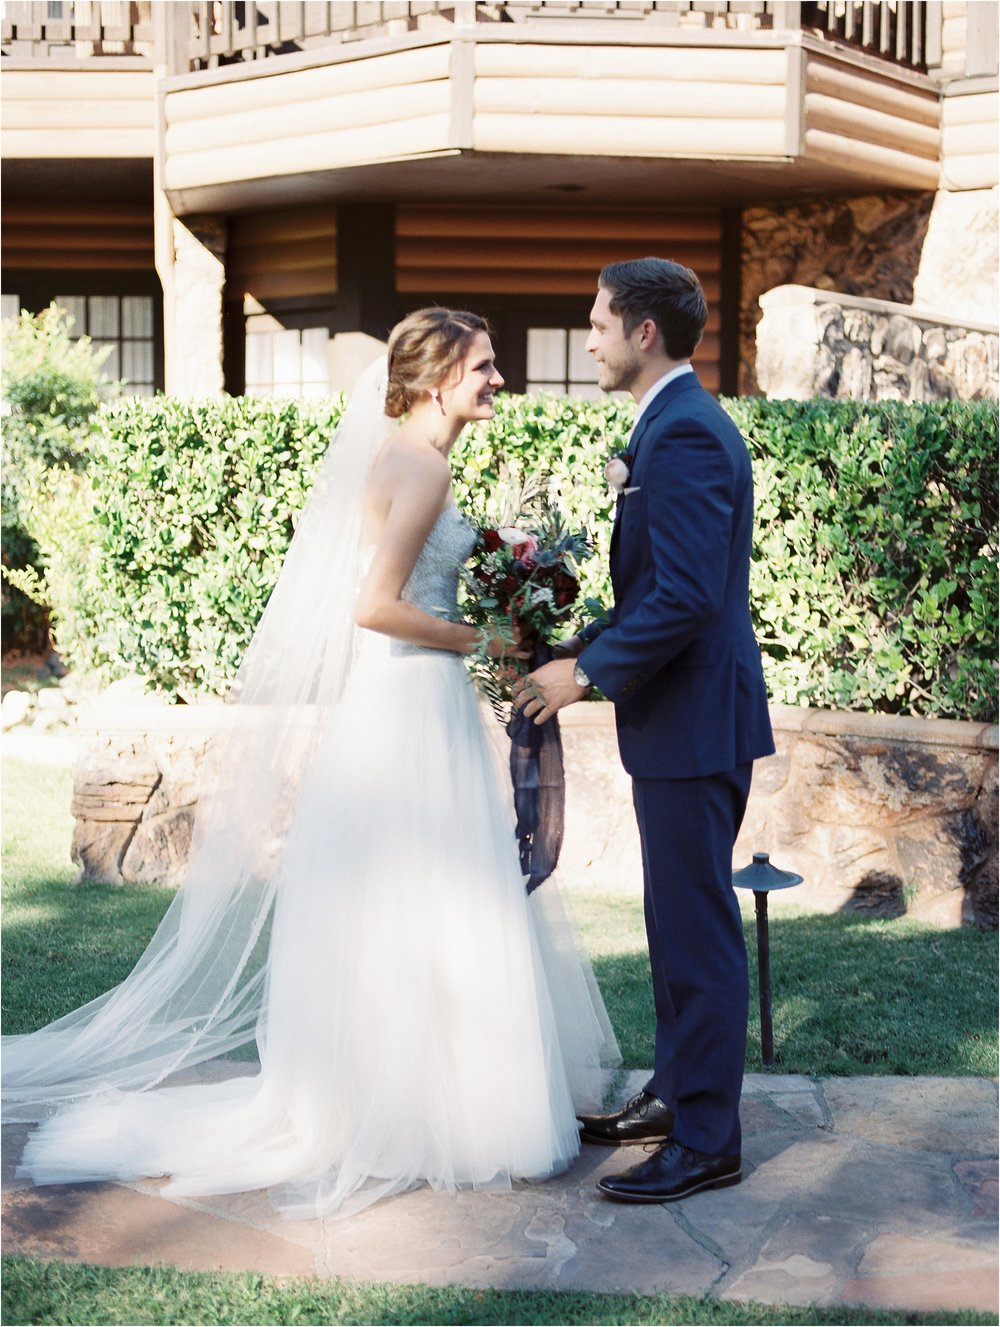 Sarah Jane Photography Film Hybrid Scottsdale Phoenix Arizona Destination Wedding Photographer sedona lauberge jon paige_0022.jpg